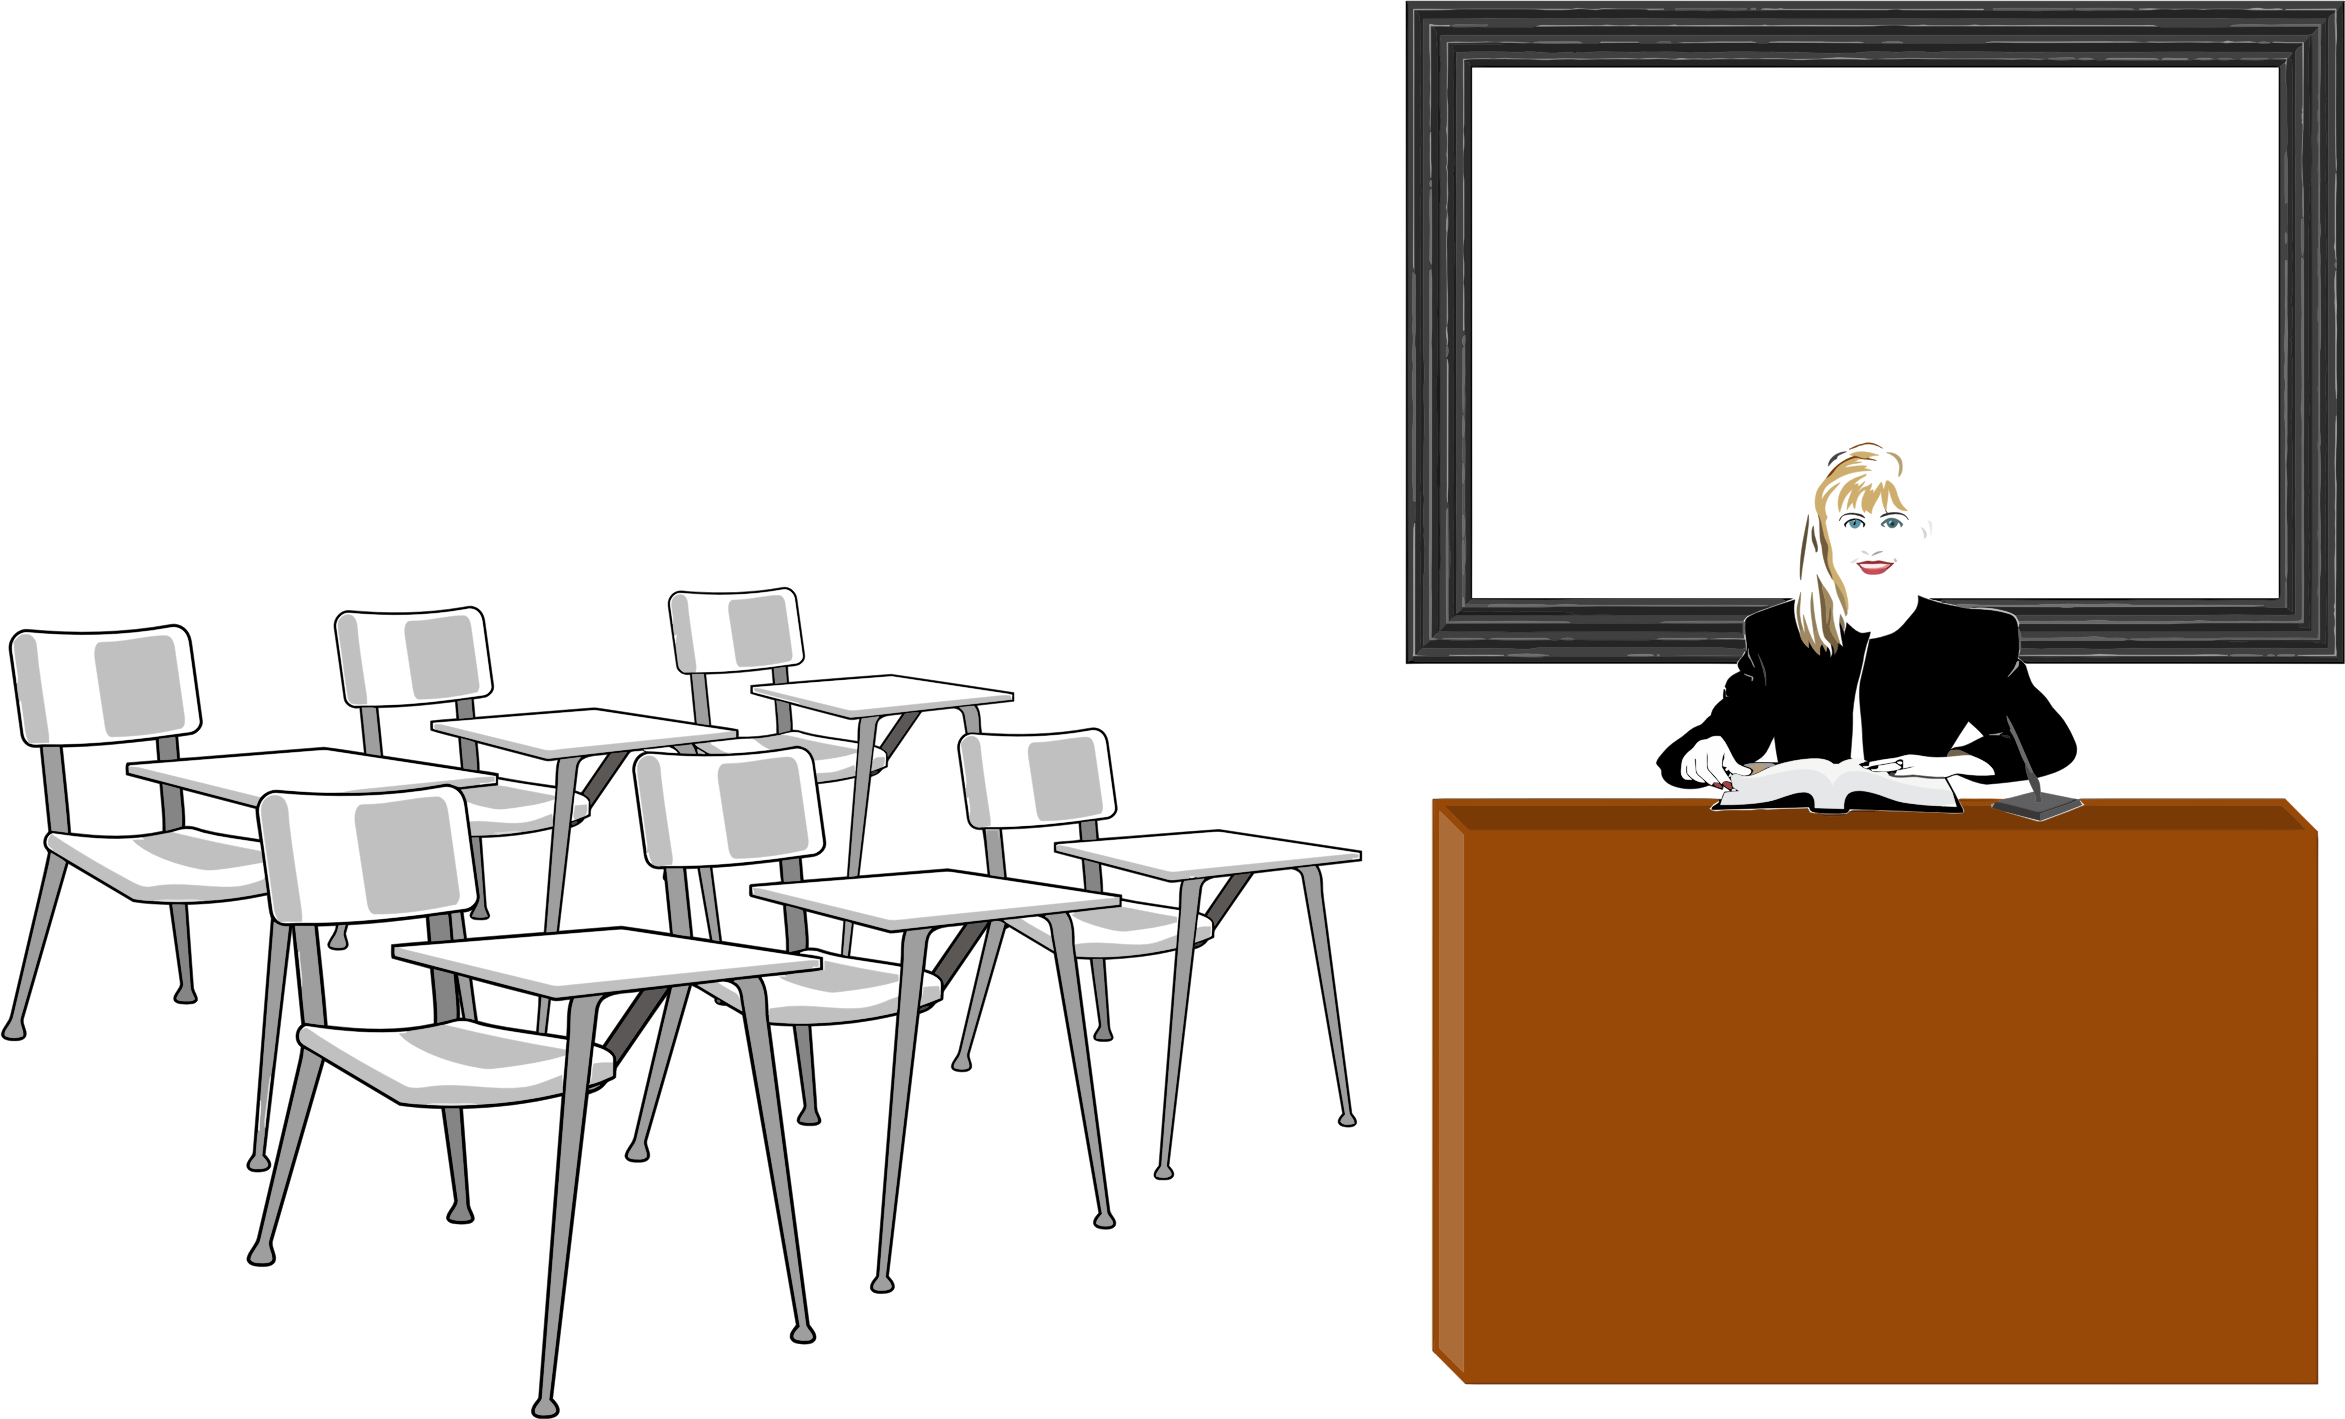 Teacher in big image. Desk clipart classroom full